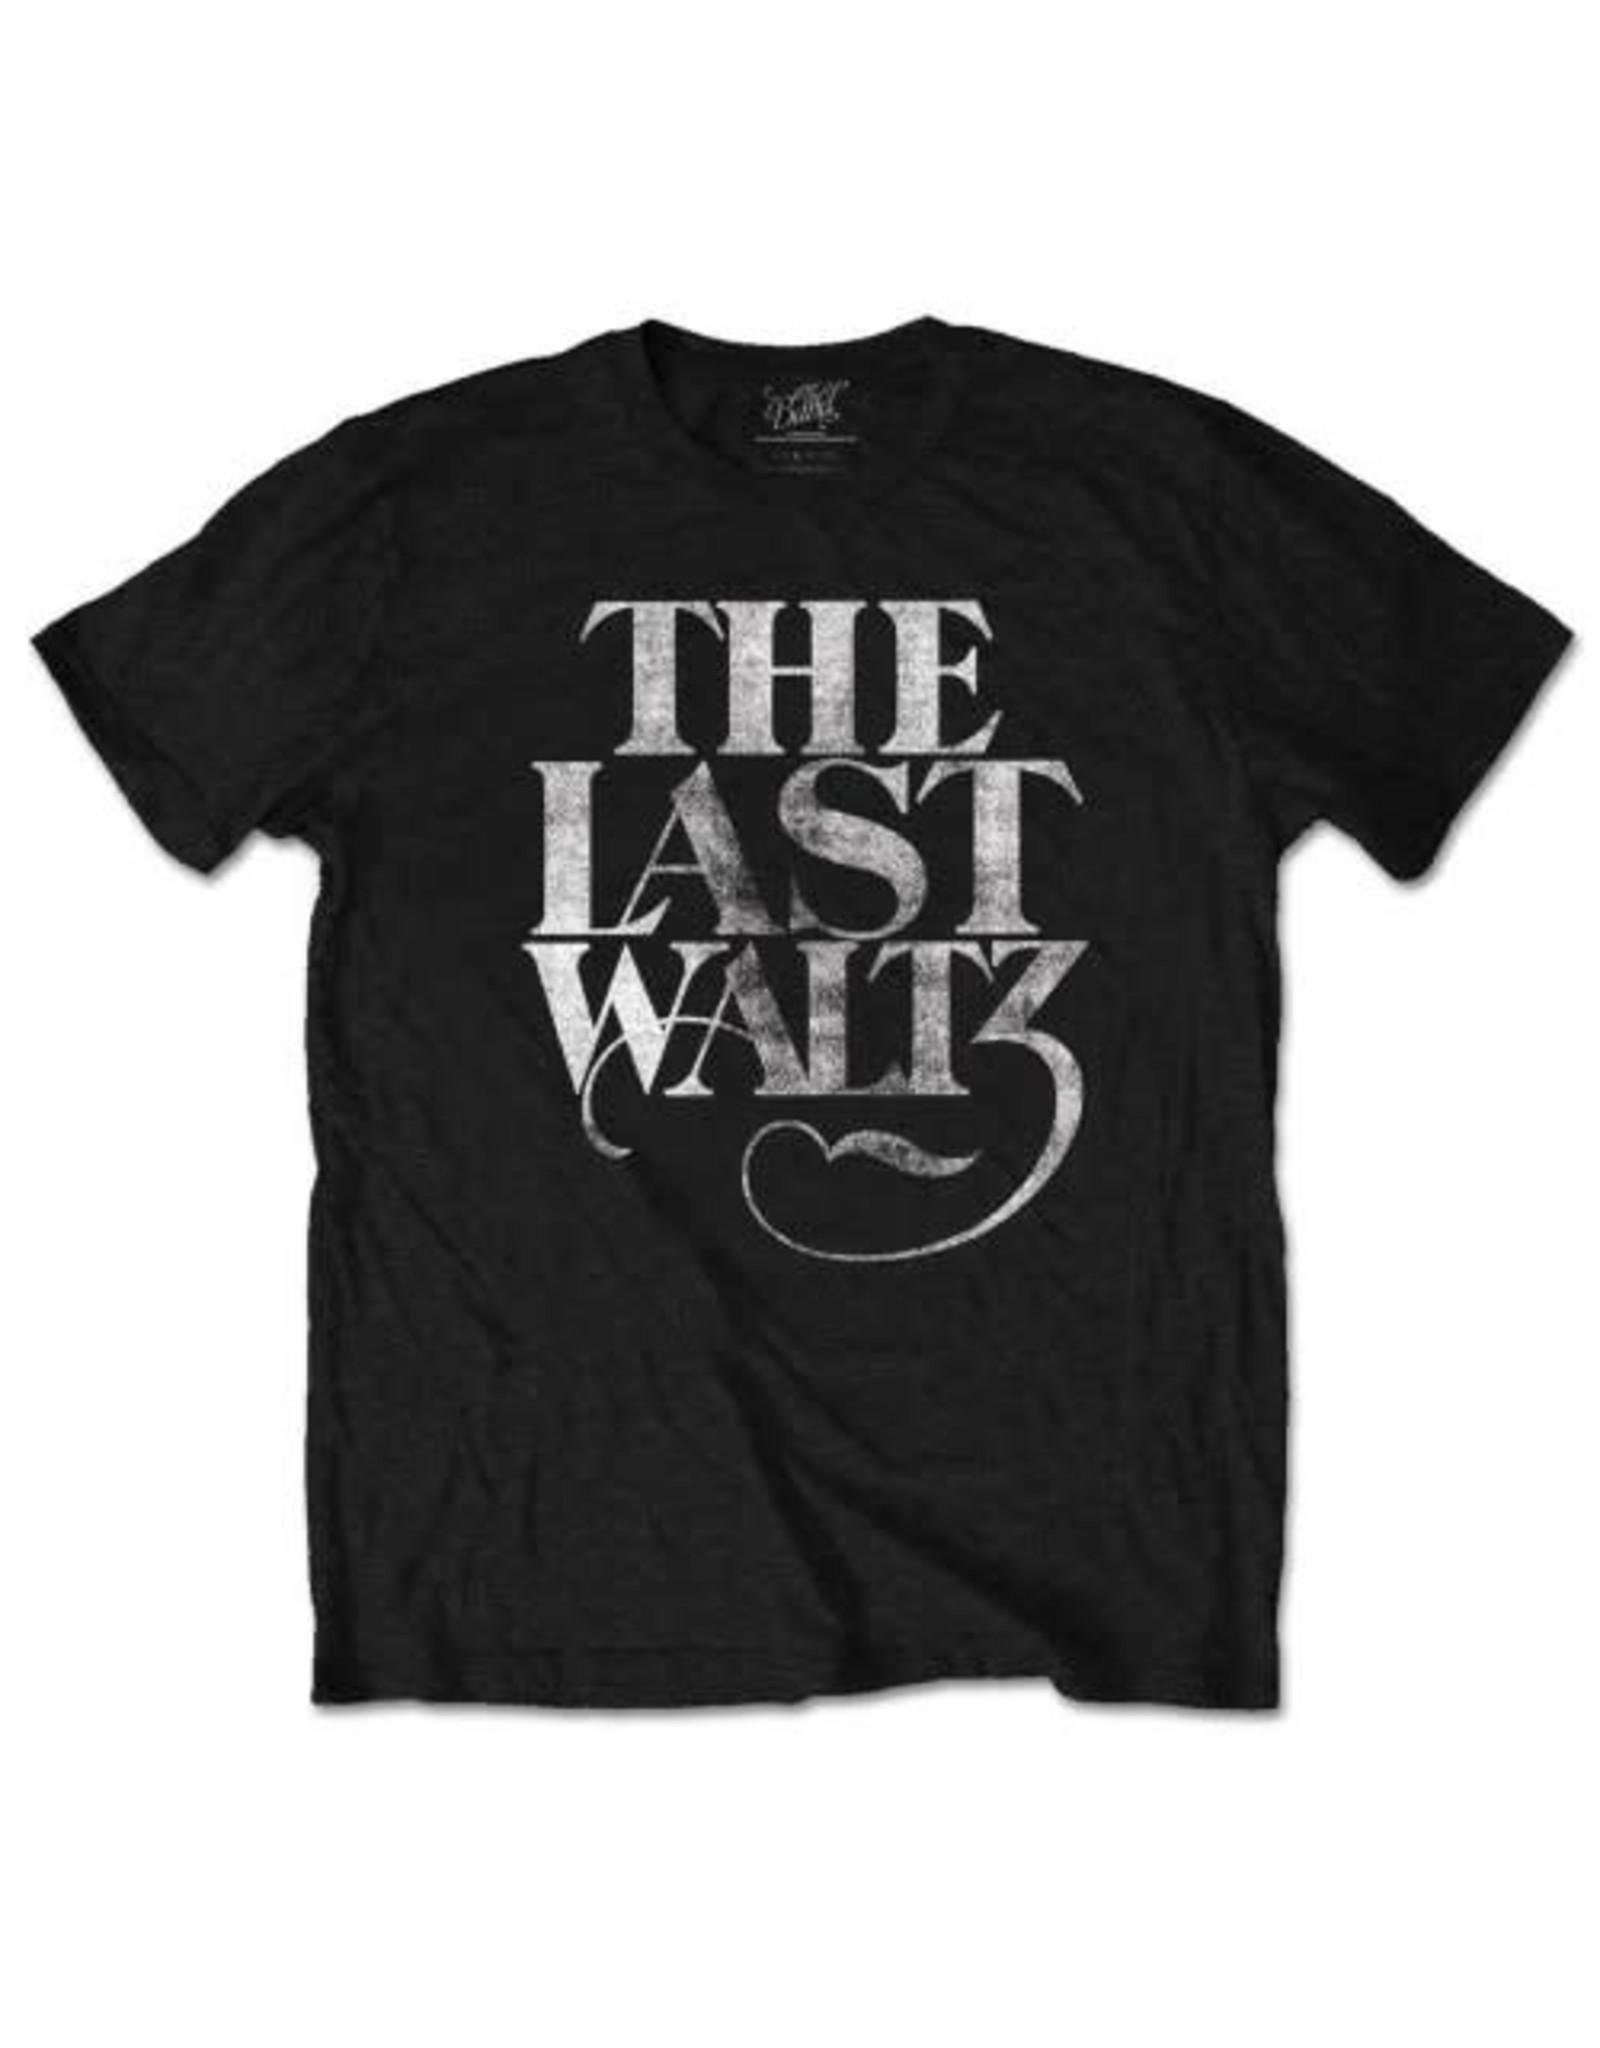 The Band / The Last Waltz Tee